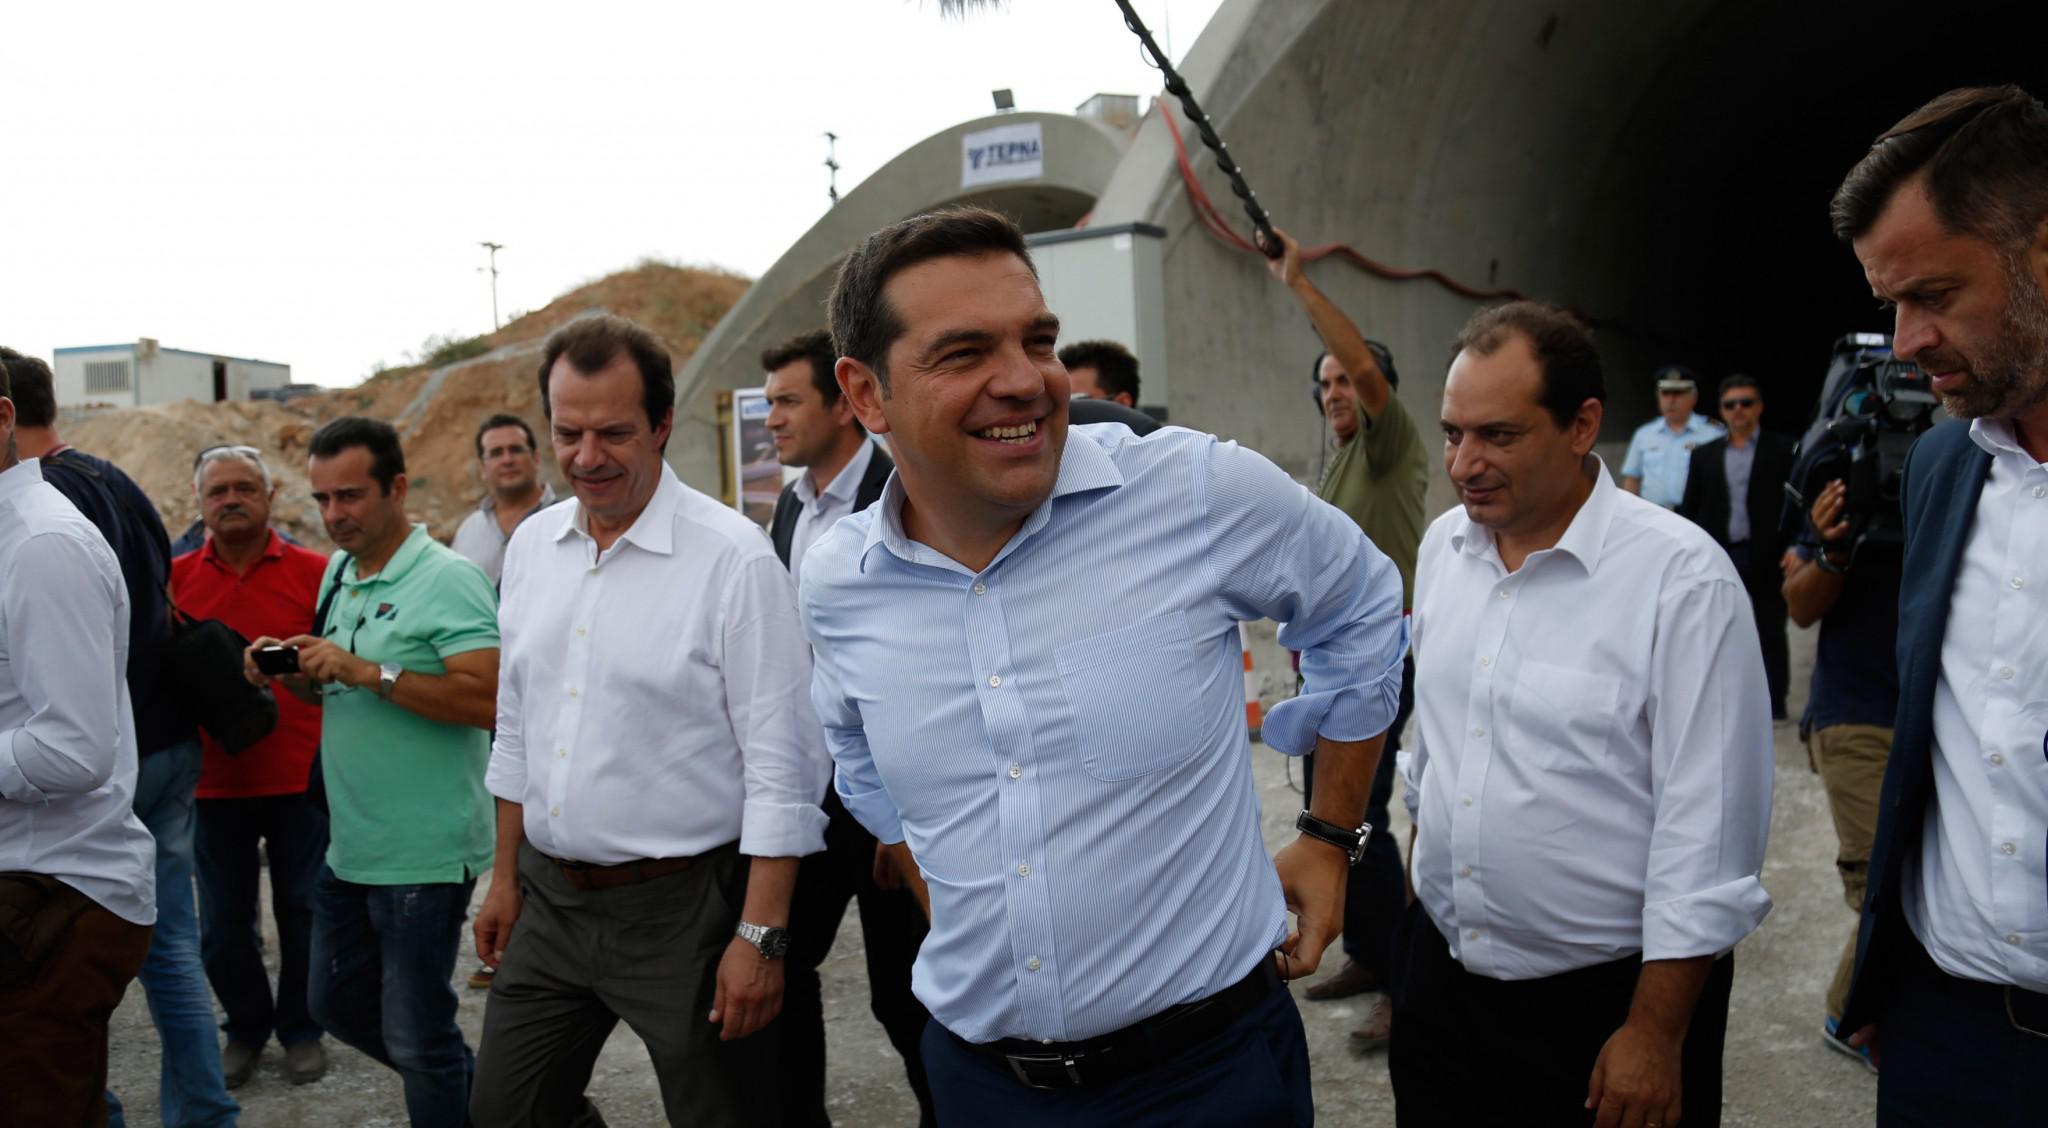 http://www.eleftherostypos.gr/wp-content/uploads/2016/09/tsipras-korinthou-patron-1.jpg